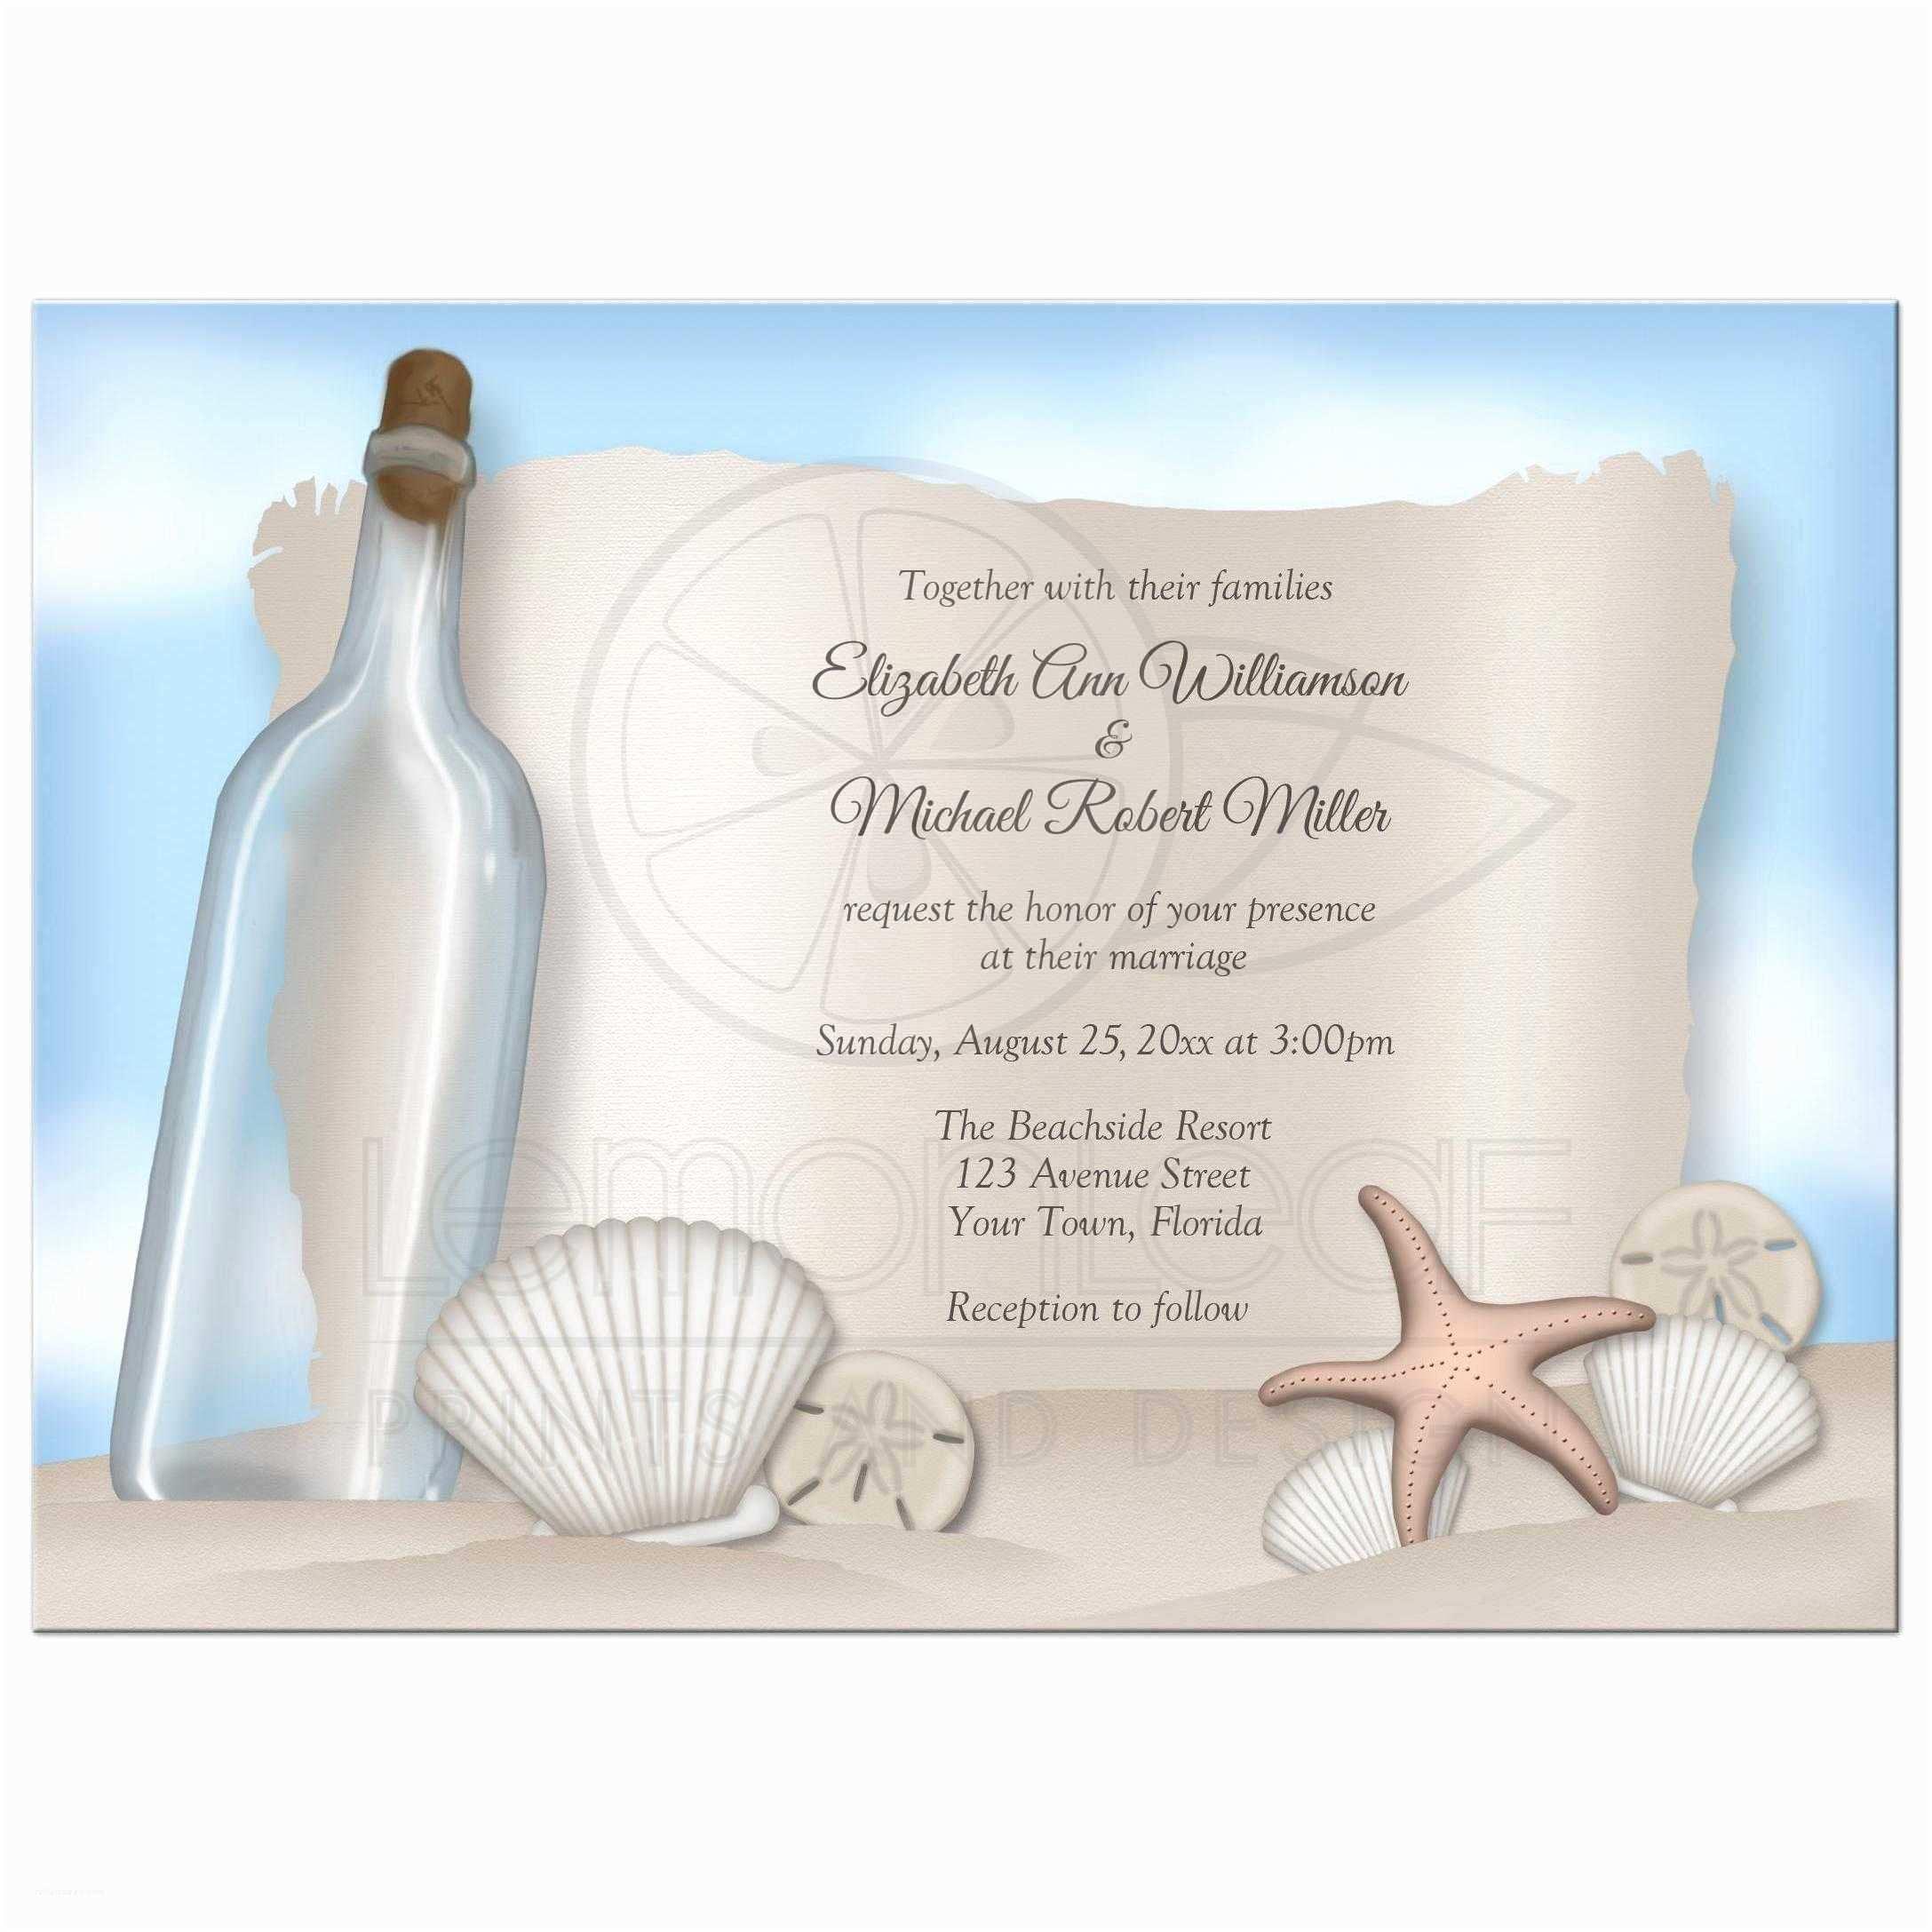 Wedding Invitation Video Wedding Invitation Beach Wedding Invitation Wording